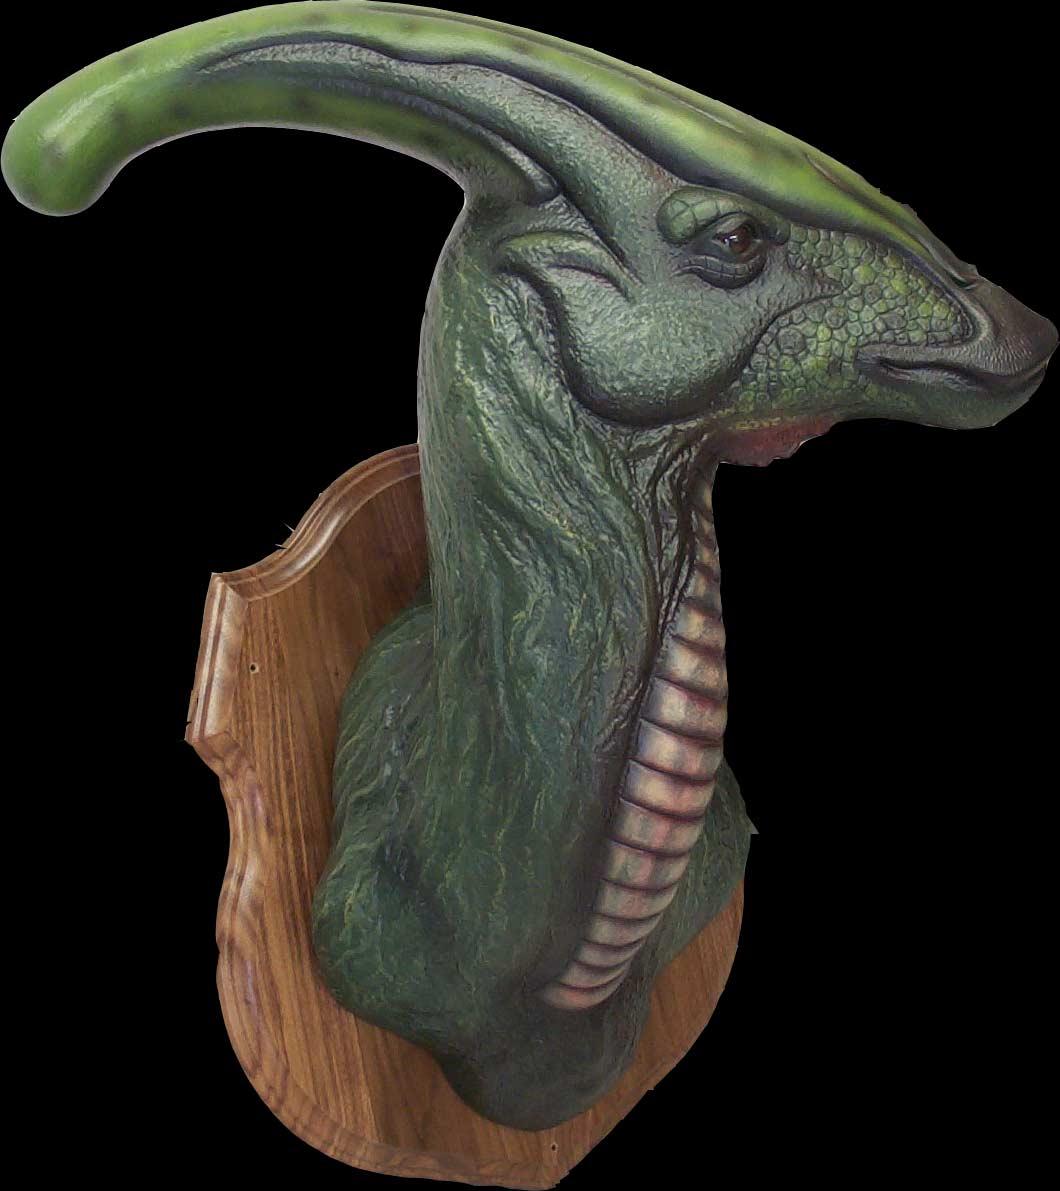 Los últimos hadrosaurios europeos eran españoles